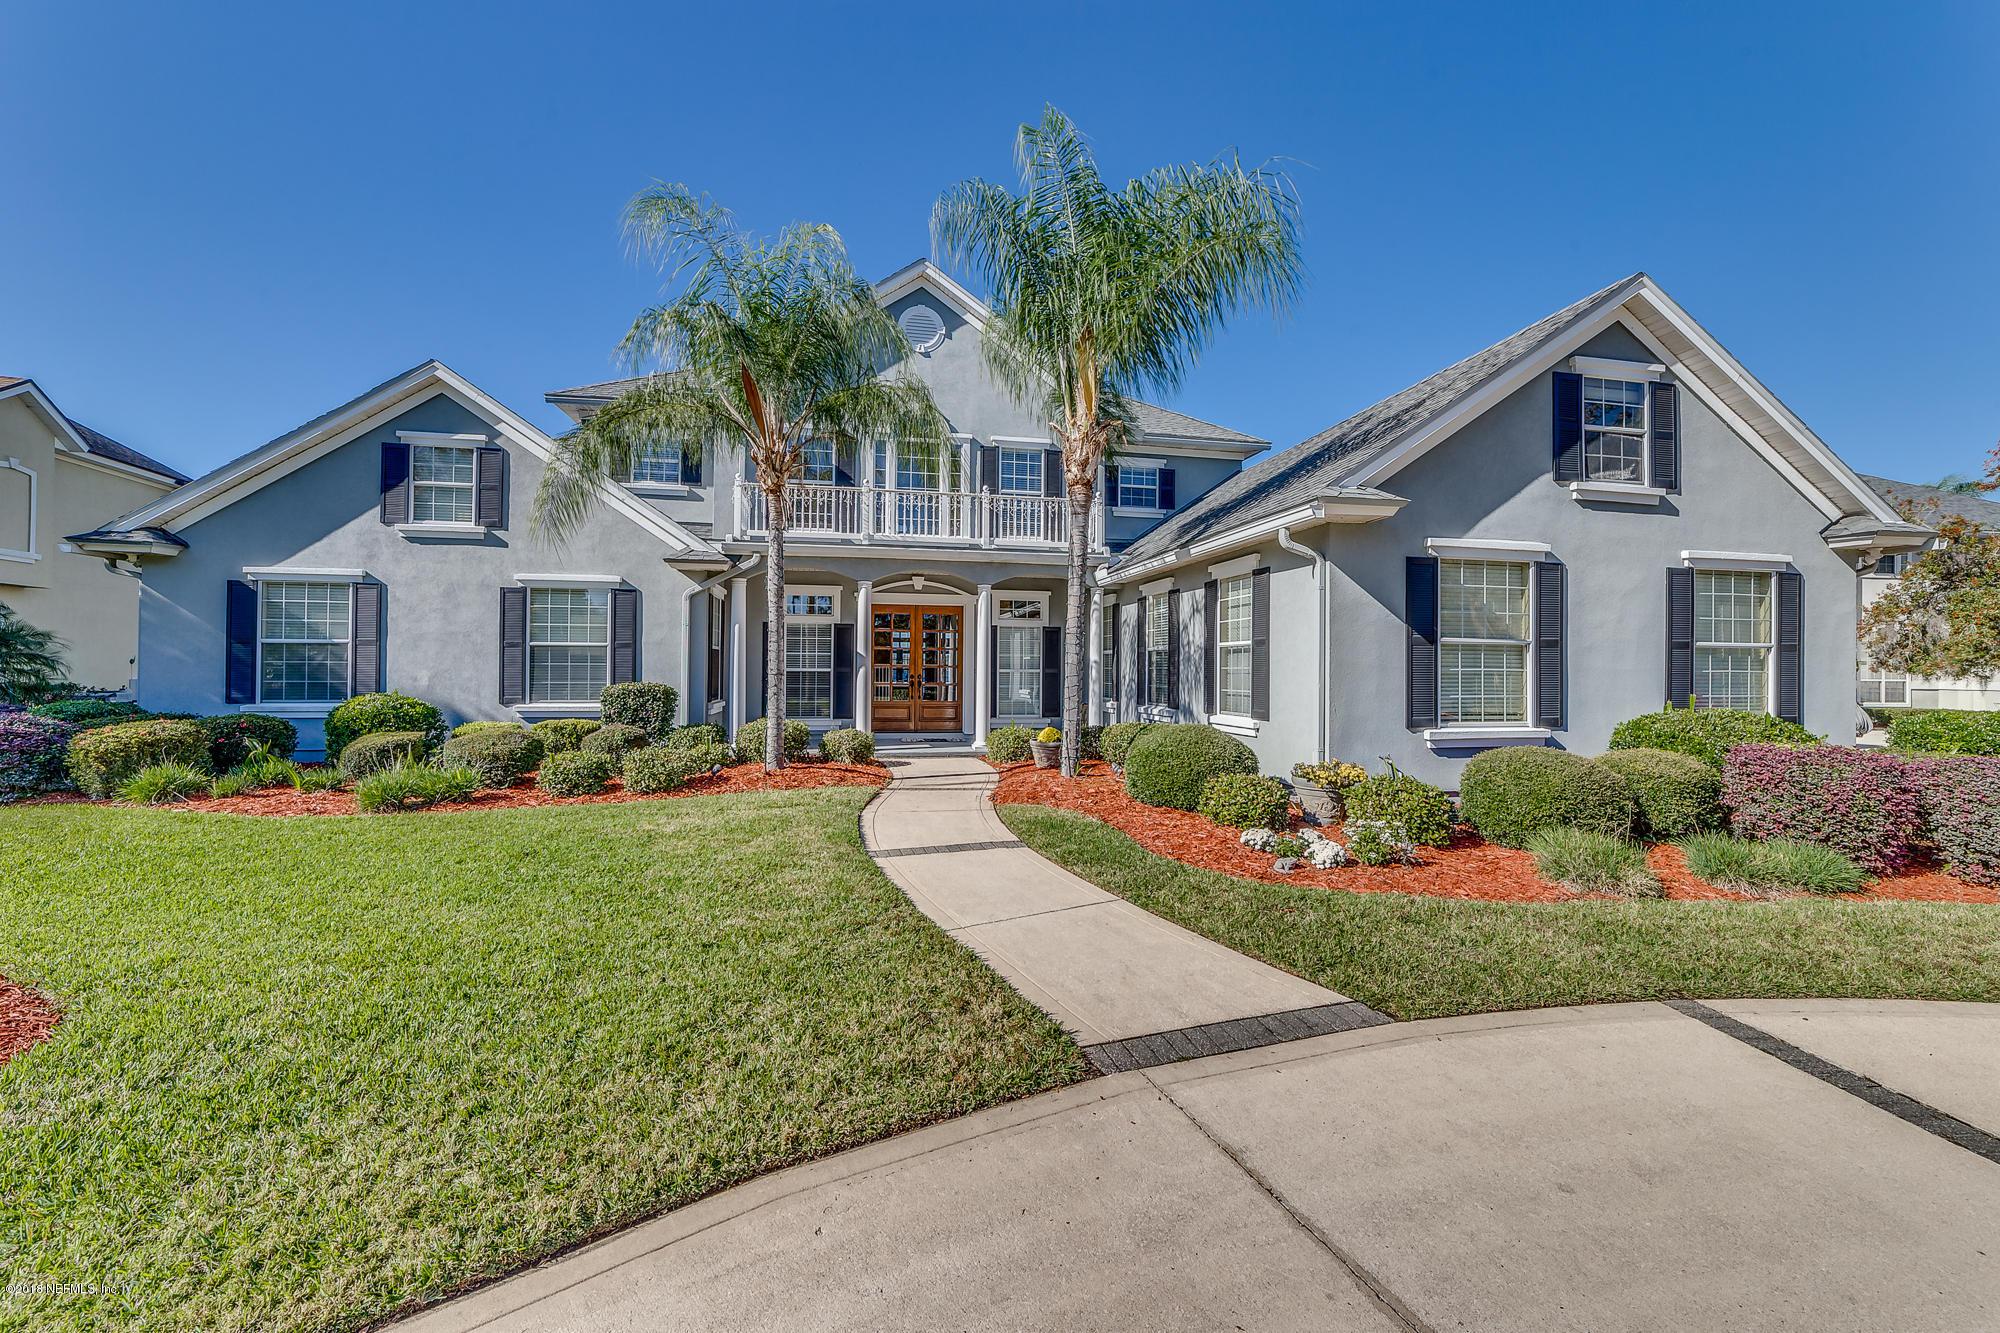 2299 LAKESHORE, ORANGE PARK, FLORIDA 32003, 6 Bedrooms Bedrooms, ,4 BathroomsBathrooms,Residential - single family,For sale,LAKESHORE,968824